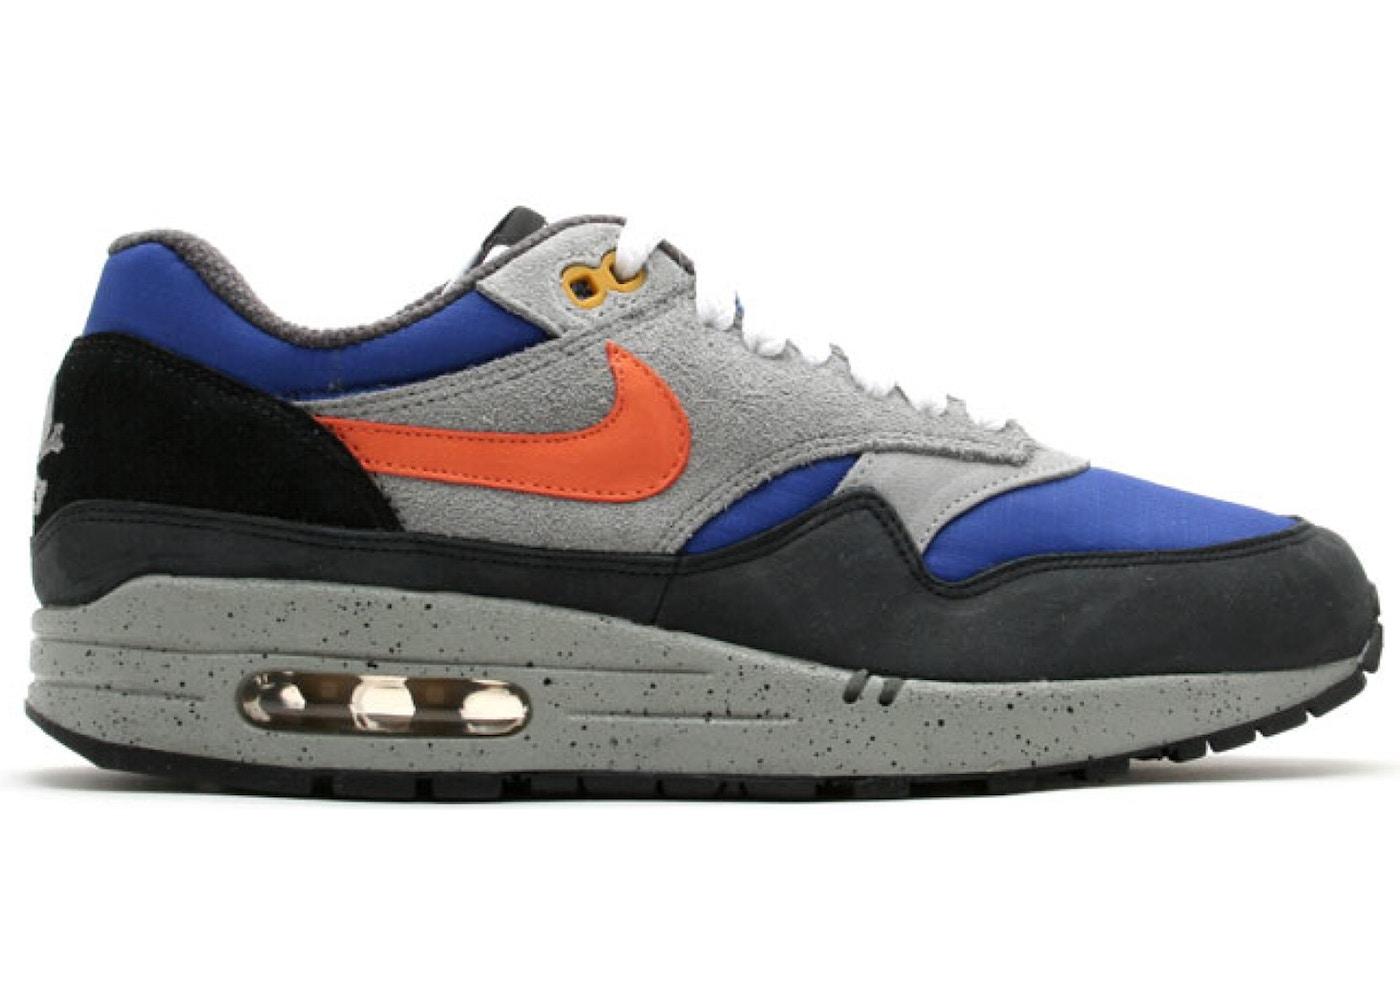 26a598cdda Nike Air Max 1 Shoes - Average Sale Price